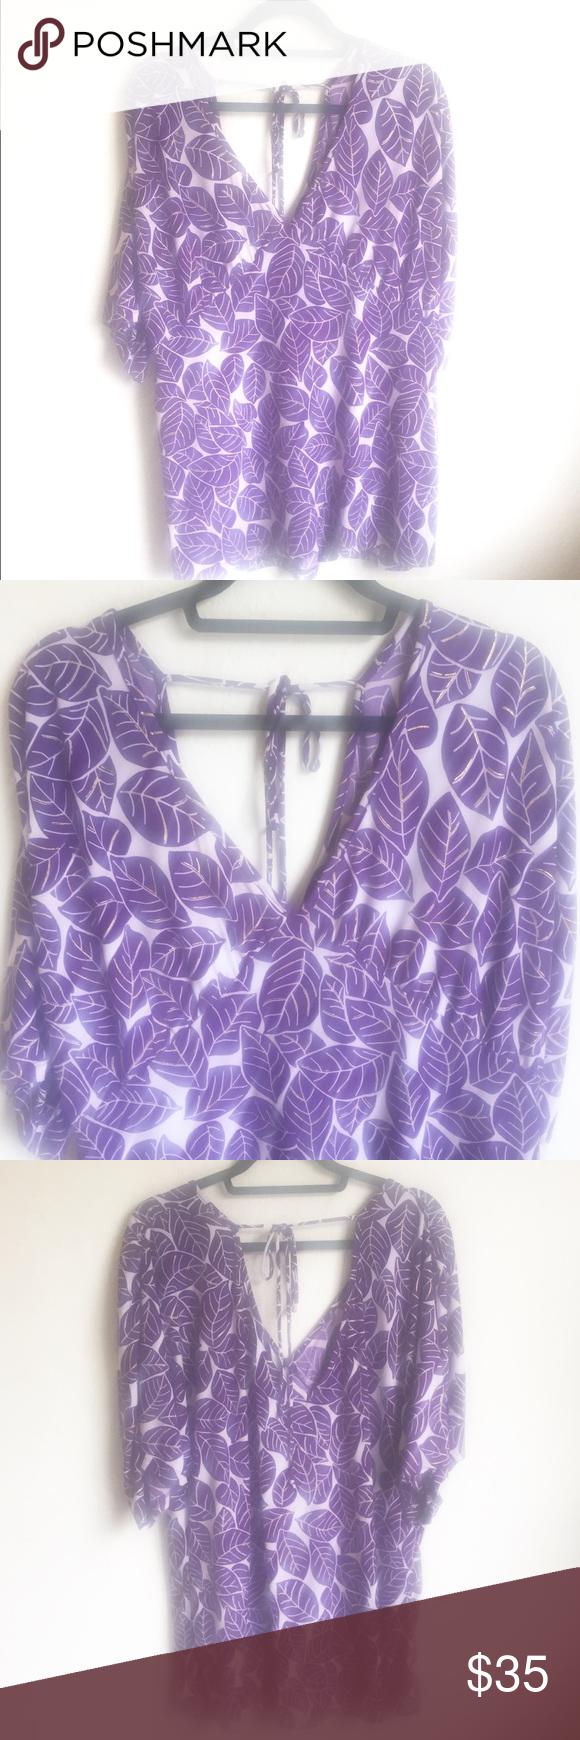 15b9b4672e648 Torrid Kimono Purple Leaves Top 3X Light weight top